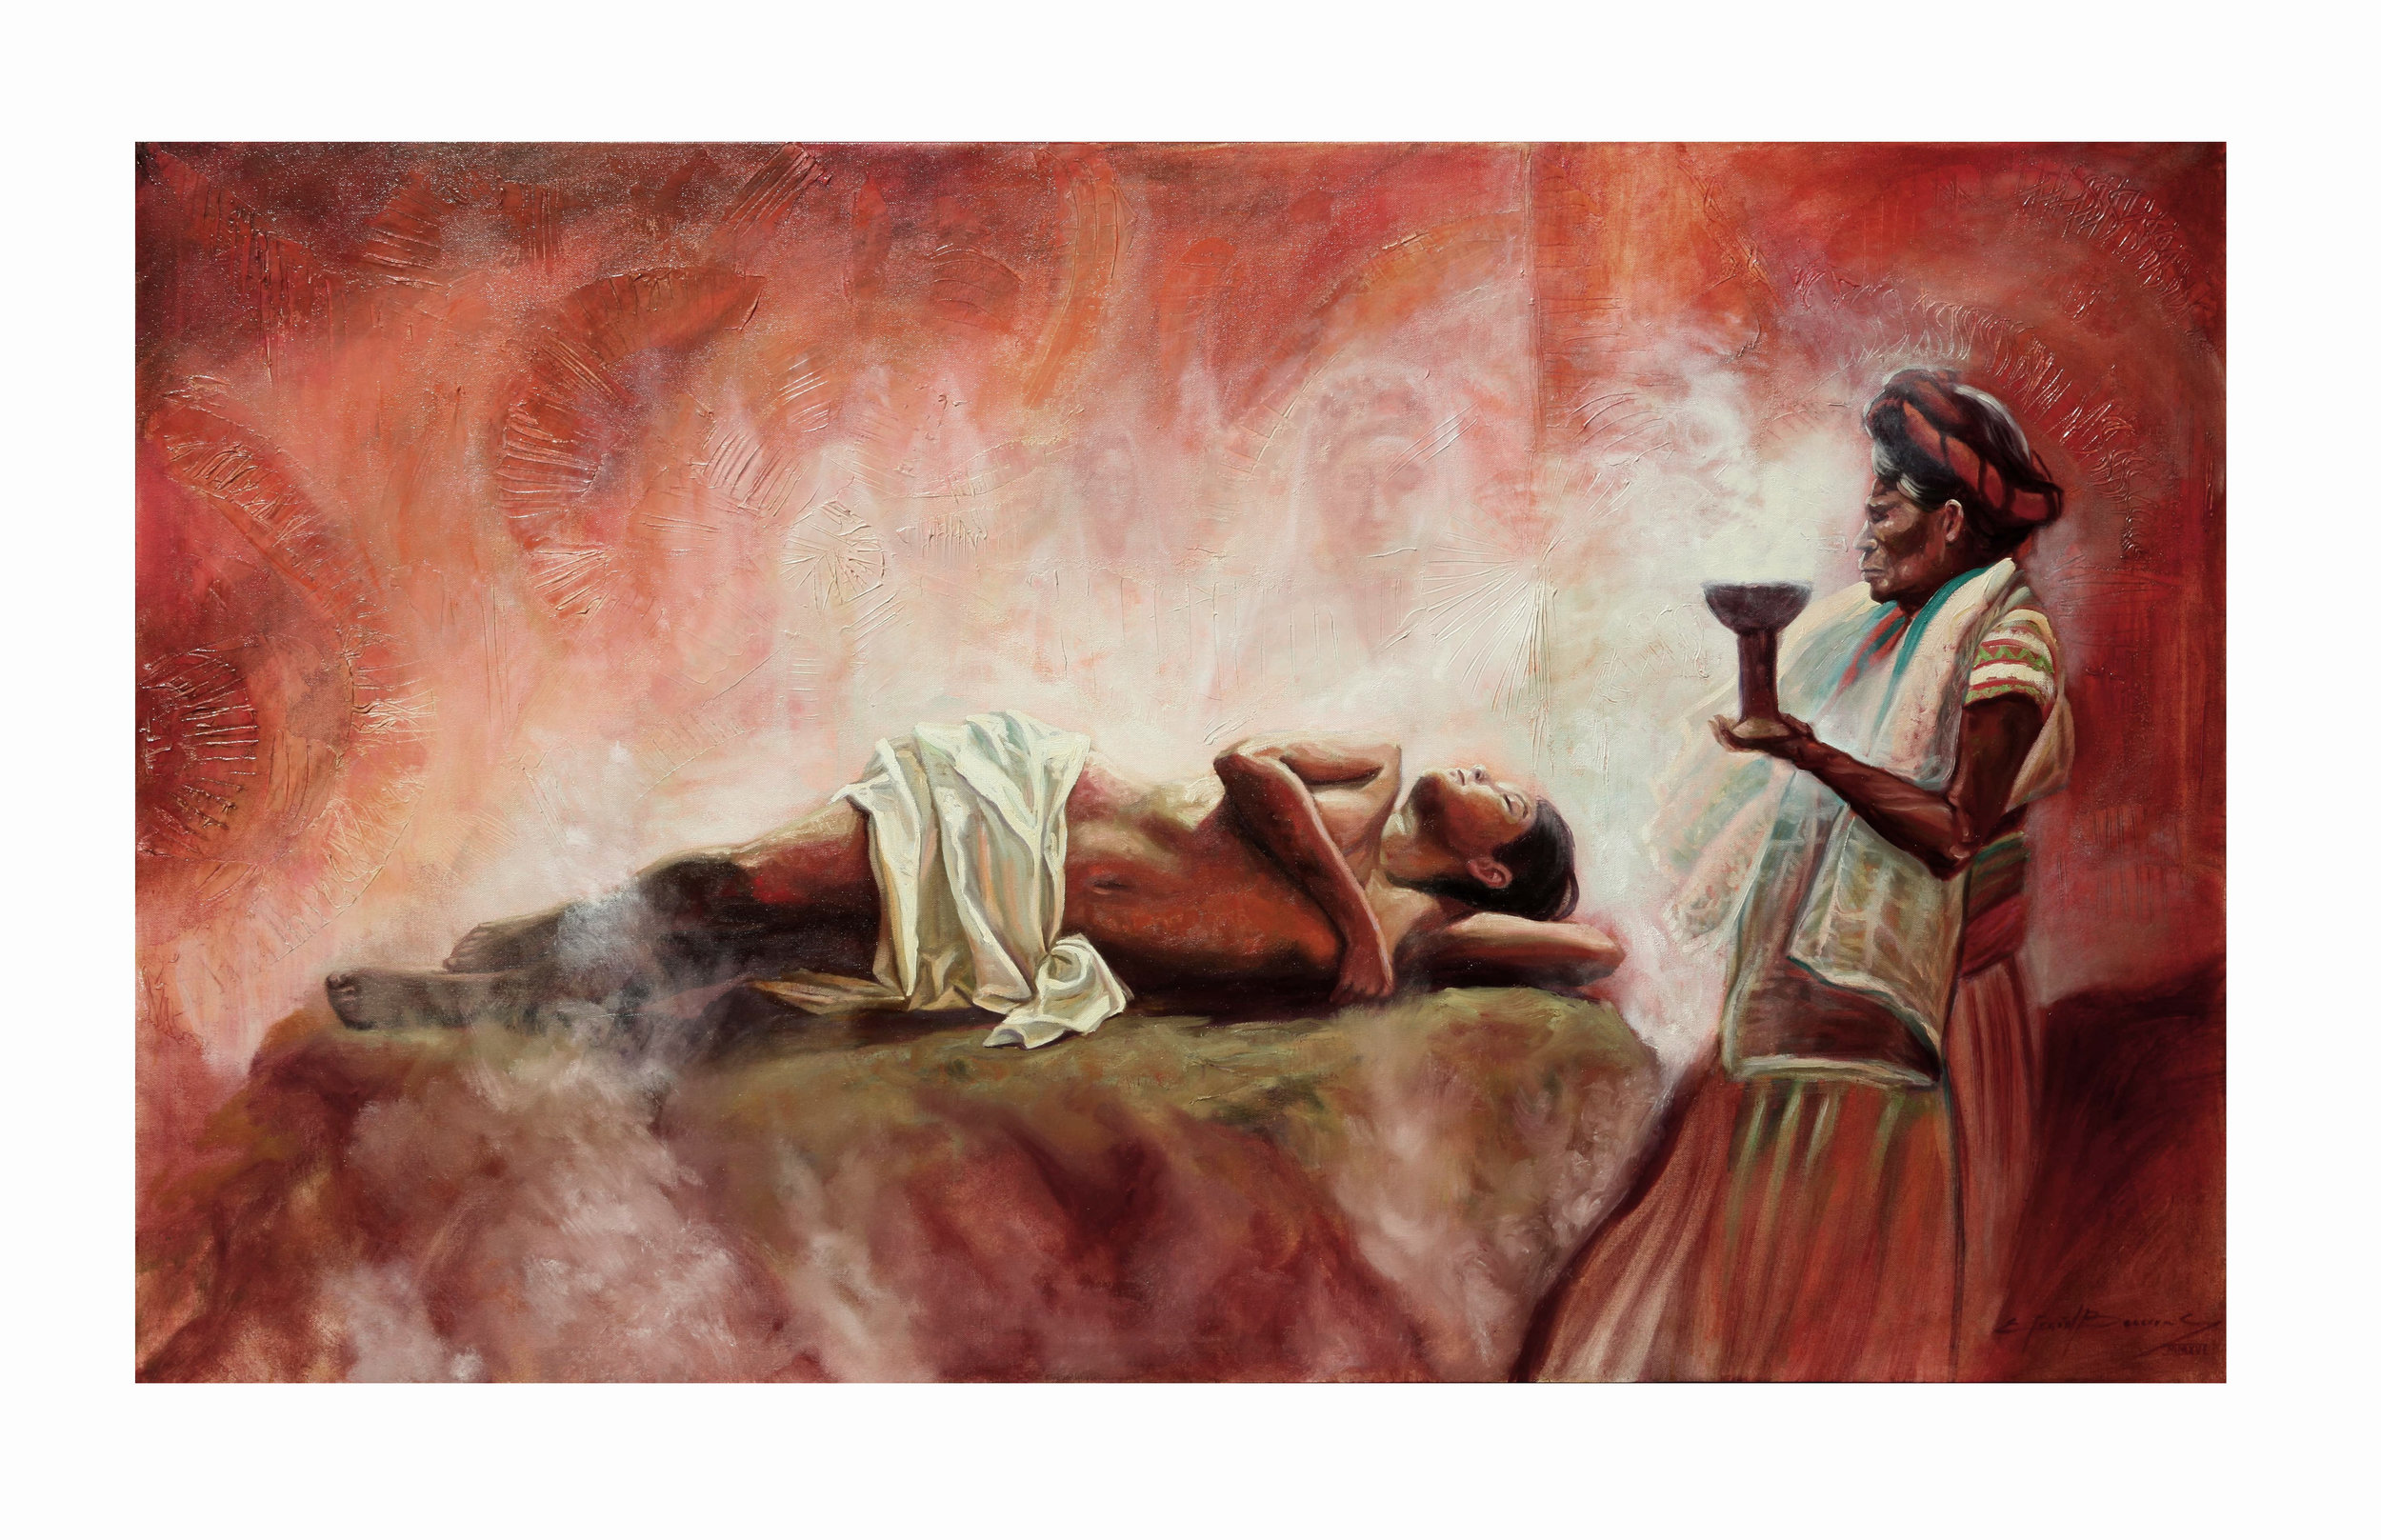 LA CURANDERA  Mixed media / canvas  36x60 in. (90x152 cm) 2015